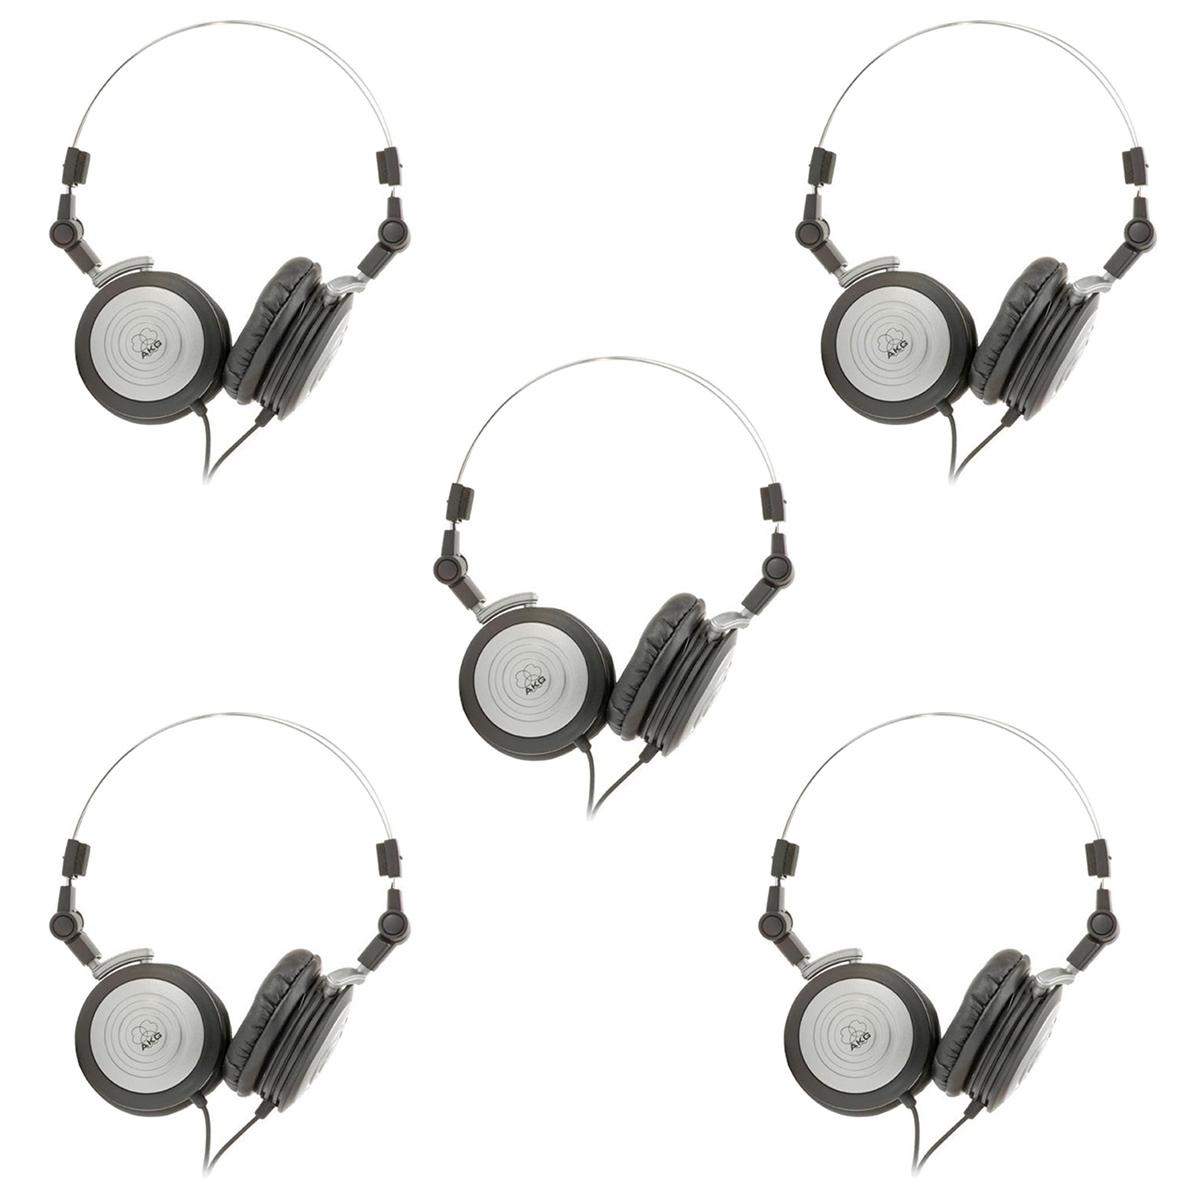 5 Fones para monitor On-ear closed back AKG K414P